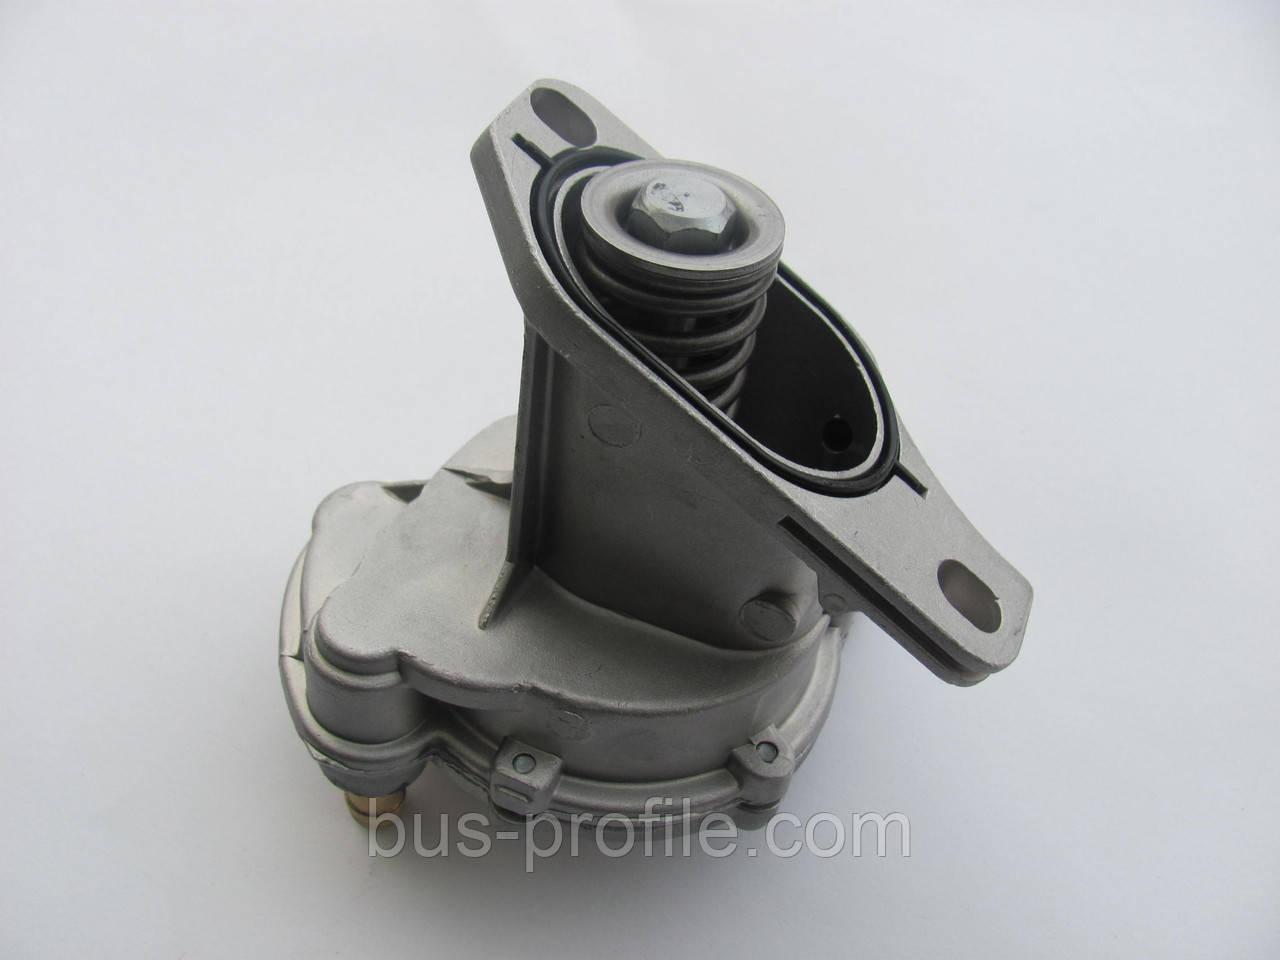 Вакуумный насос  на VW LT, T-4  2.5 TDI/SDI, AUDI  1996-2006 — Begel (Турция) — BG13007